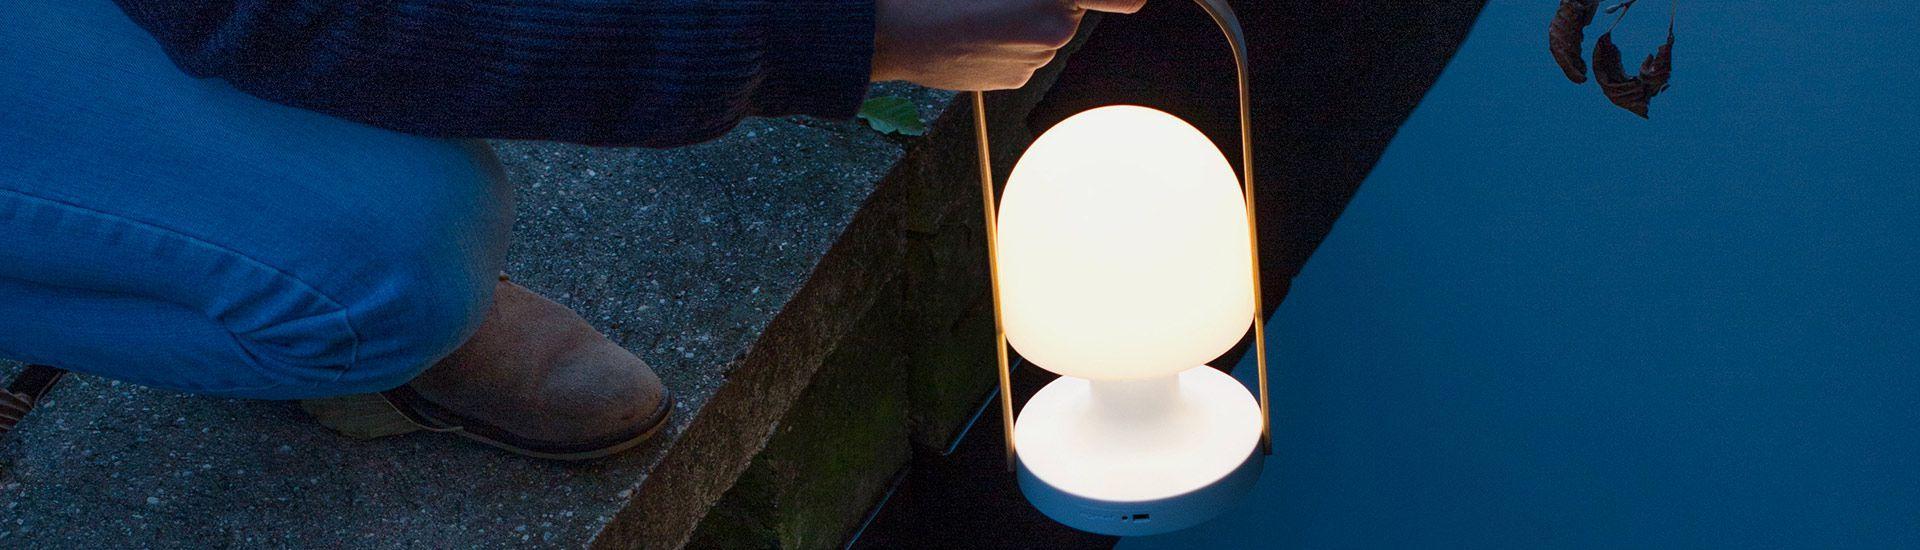 Santorini Pendelleuchte E27 LED Classic 8W weiß